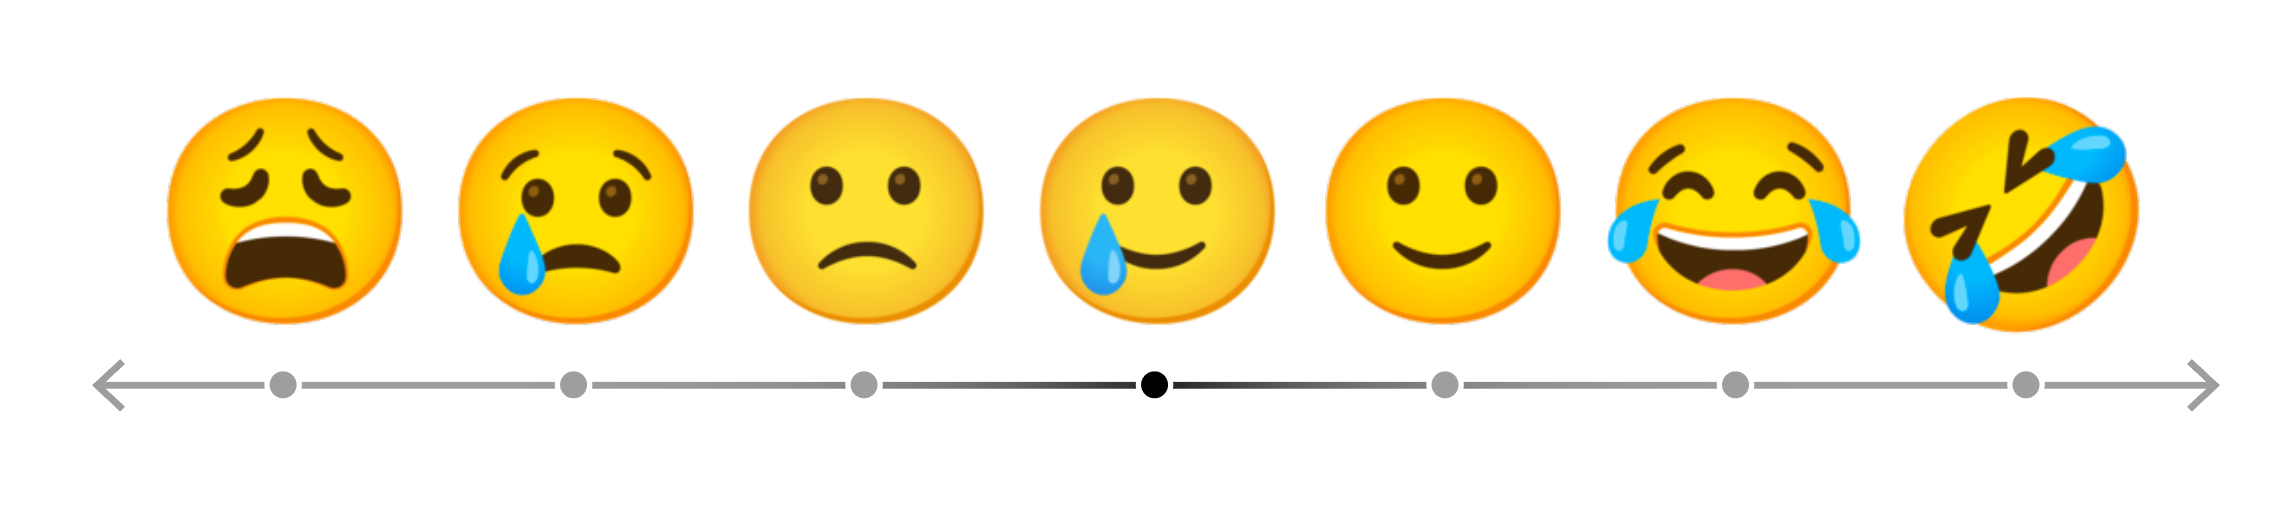 I'm so proud of you :,) - by Jennifer Daniel - Did Someone Say Emoji?